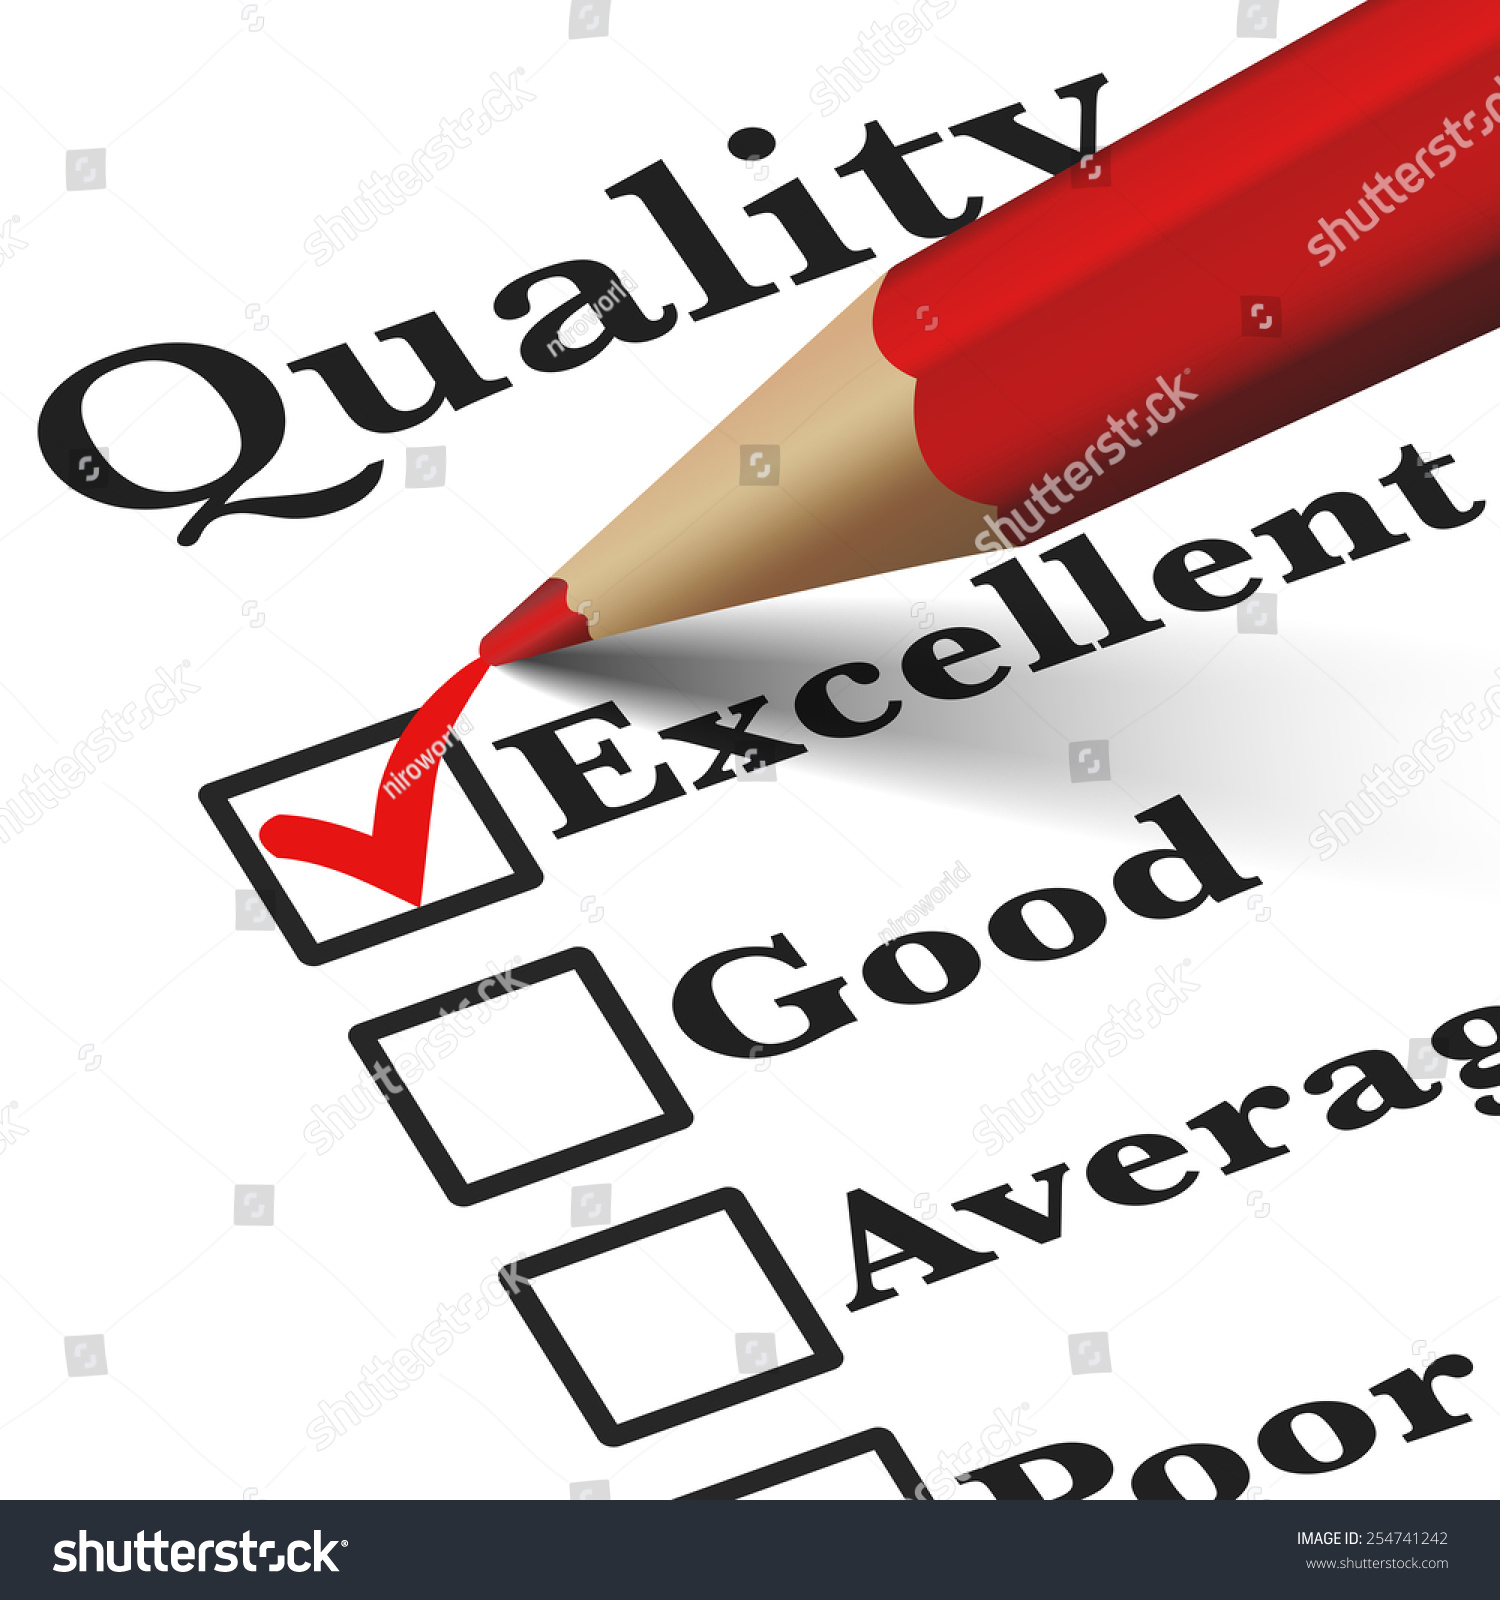 quality of good customer service